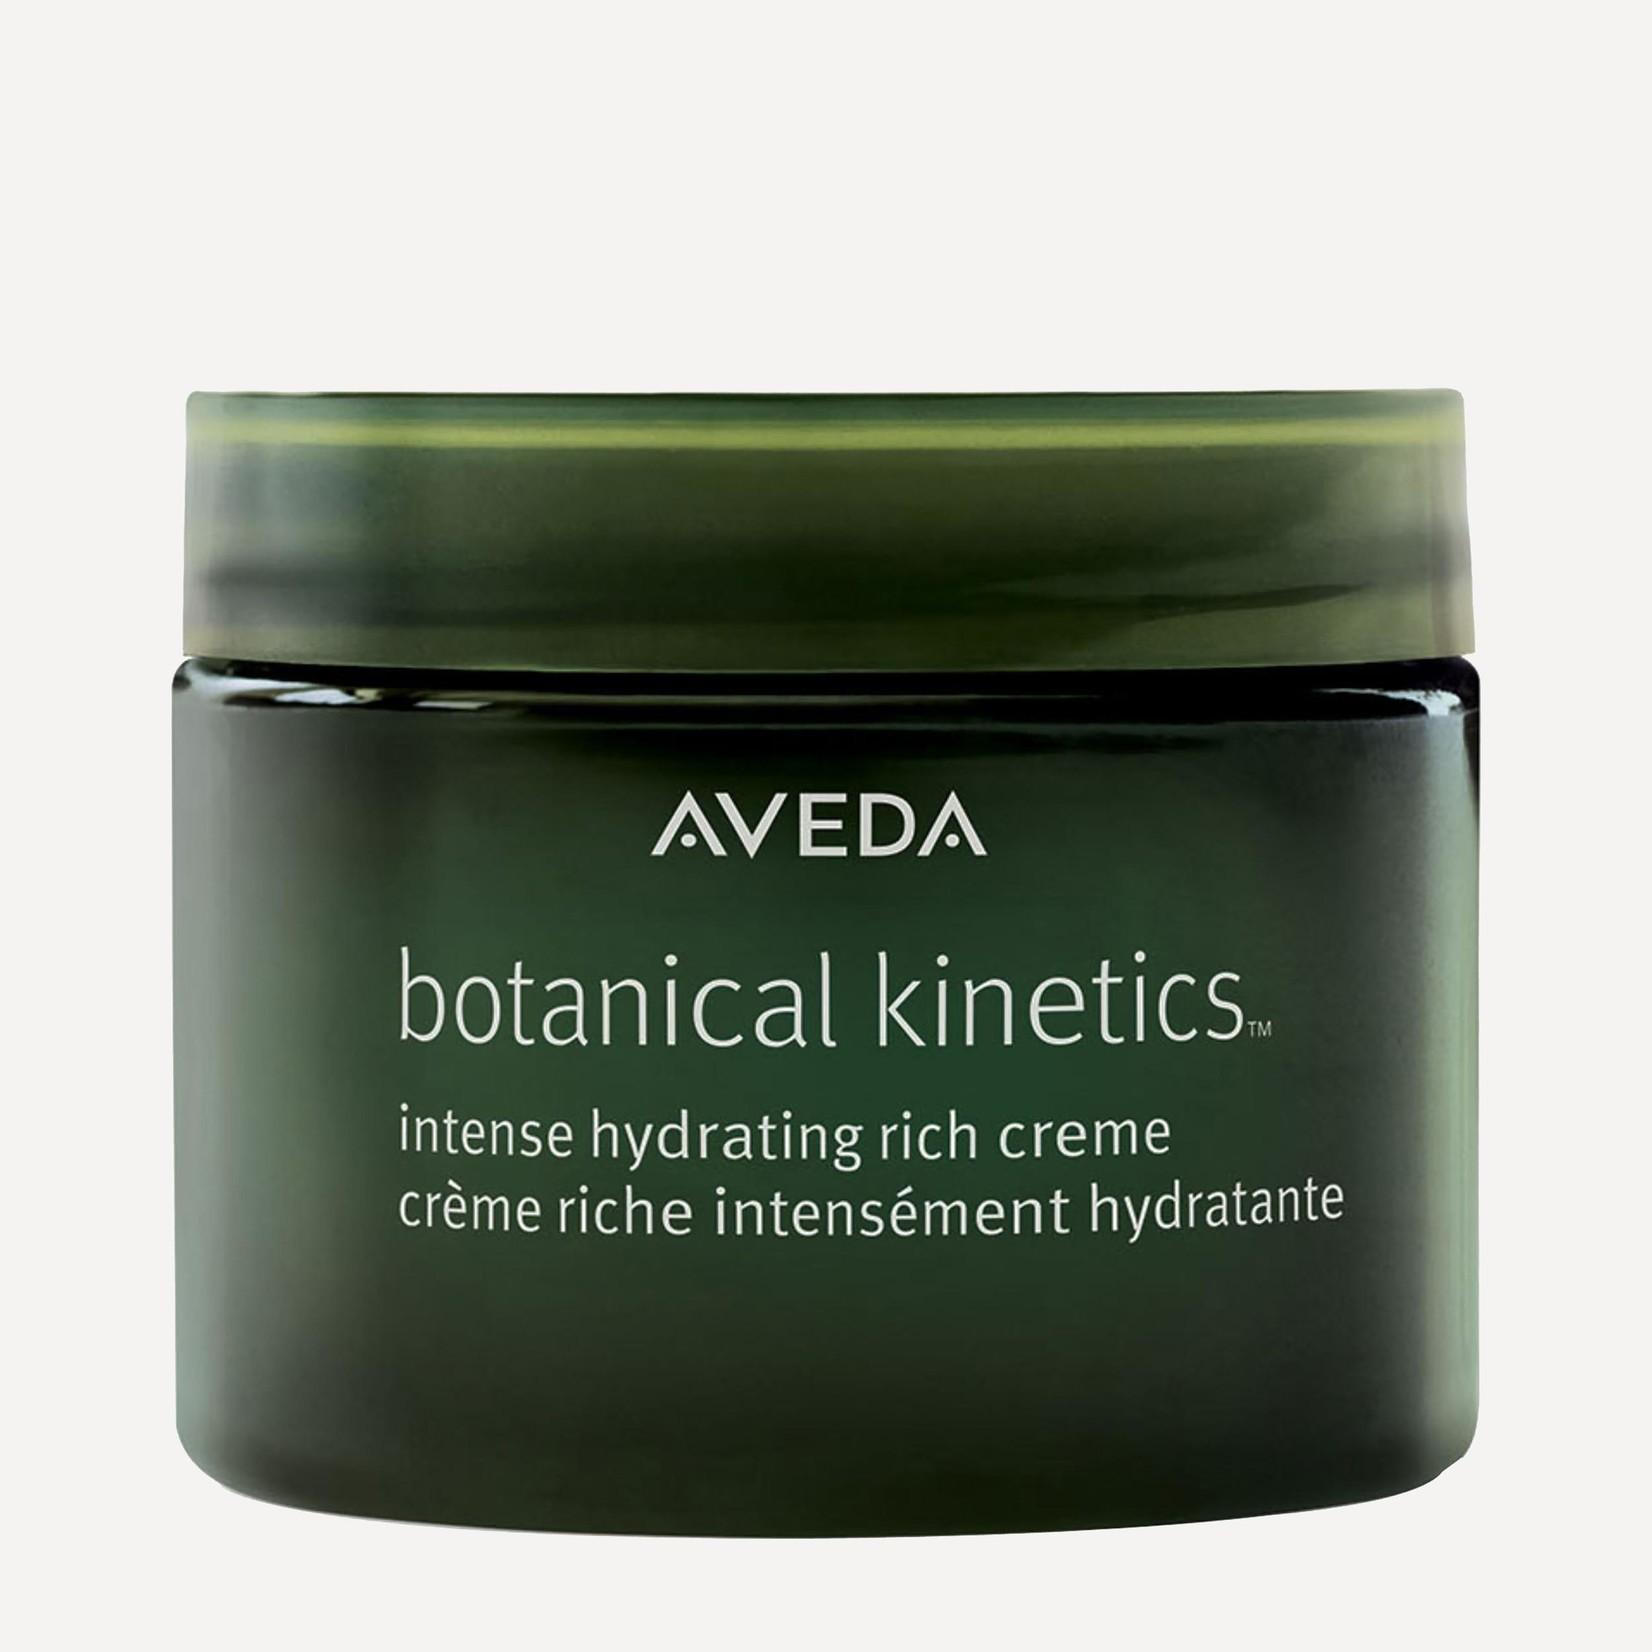 AVEDA Botanical Kinetics™ Intense Hydrating Rich Creme